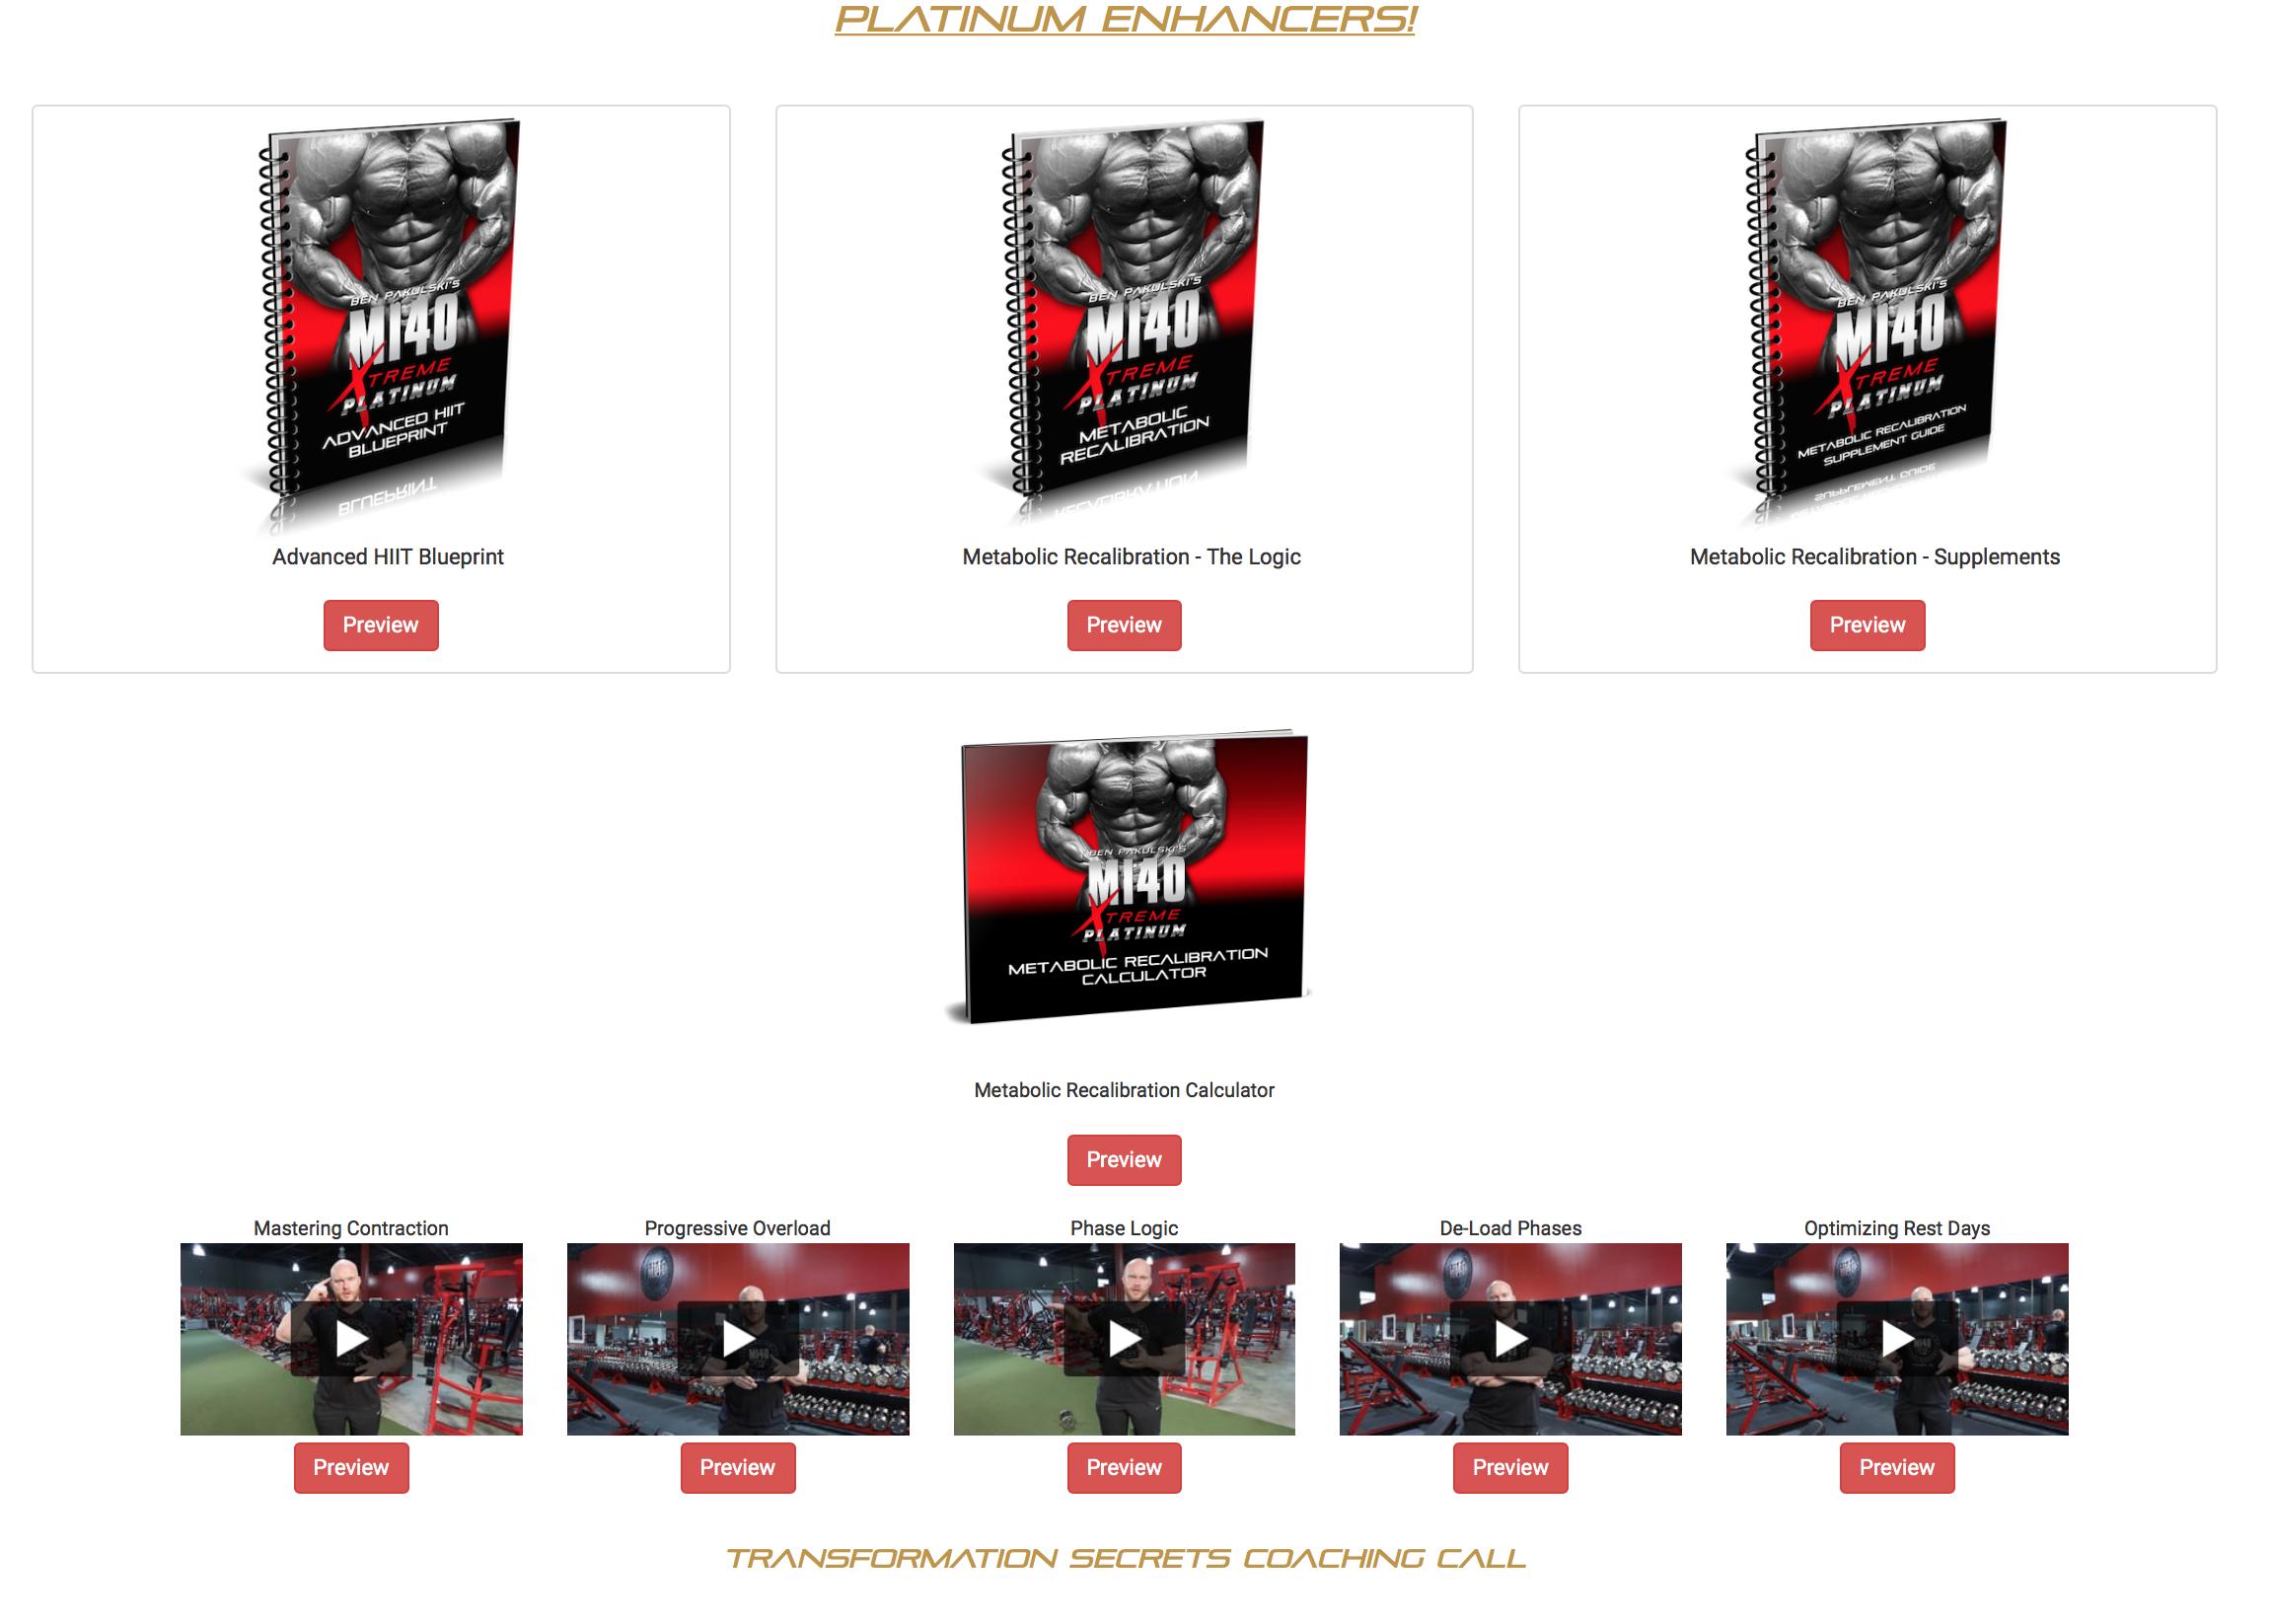 MI40 Xtreme Platinum Enhancers